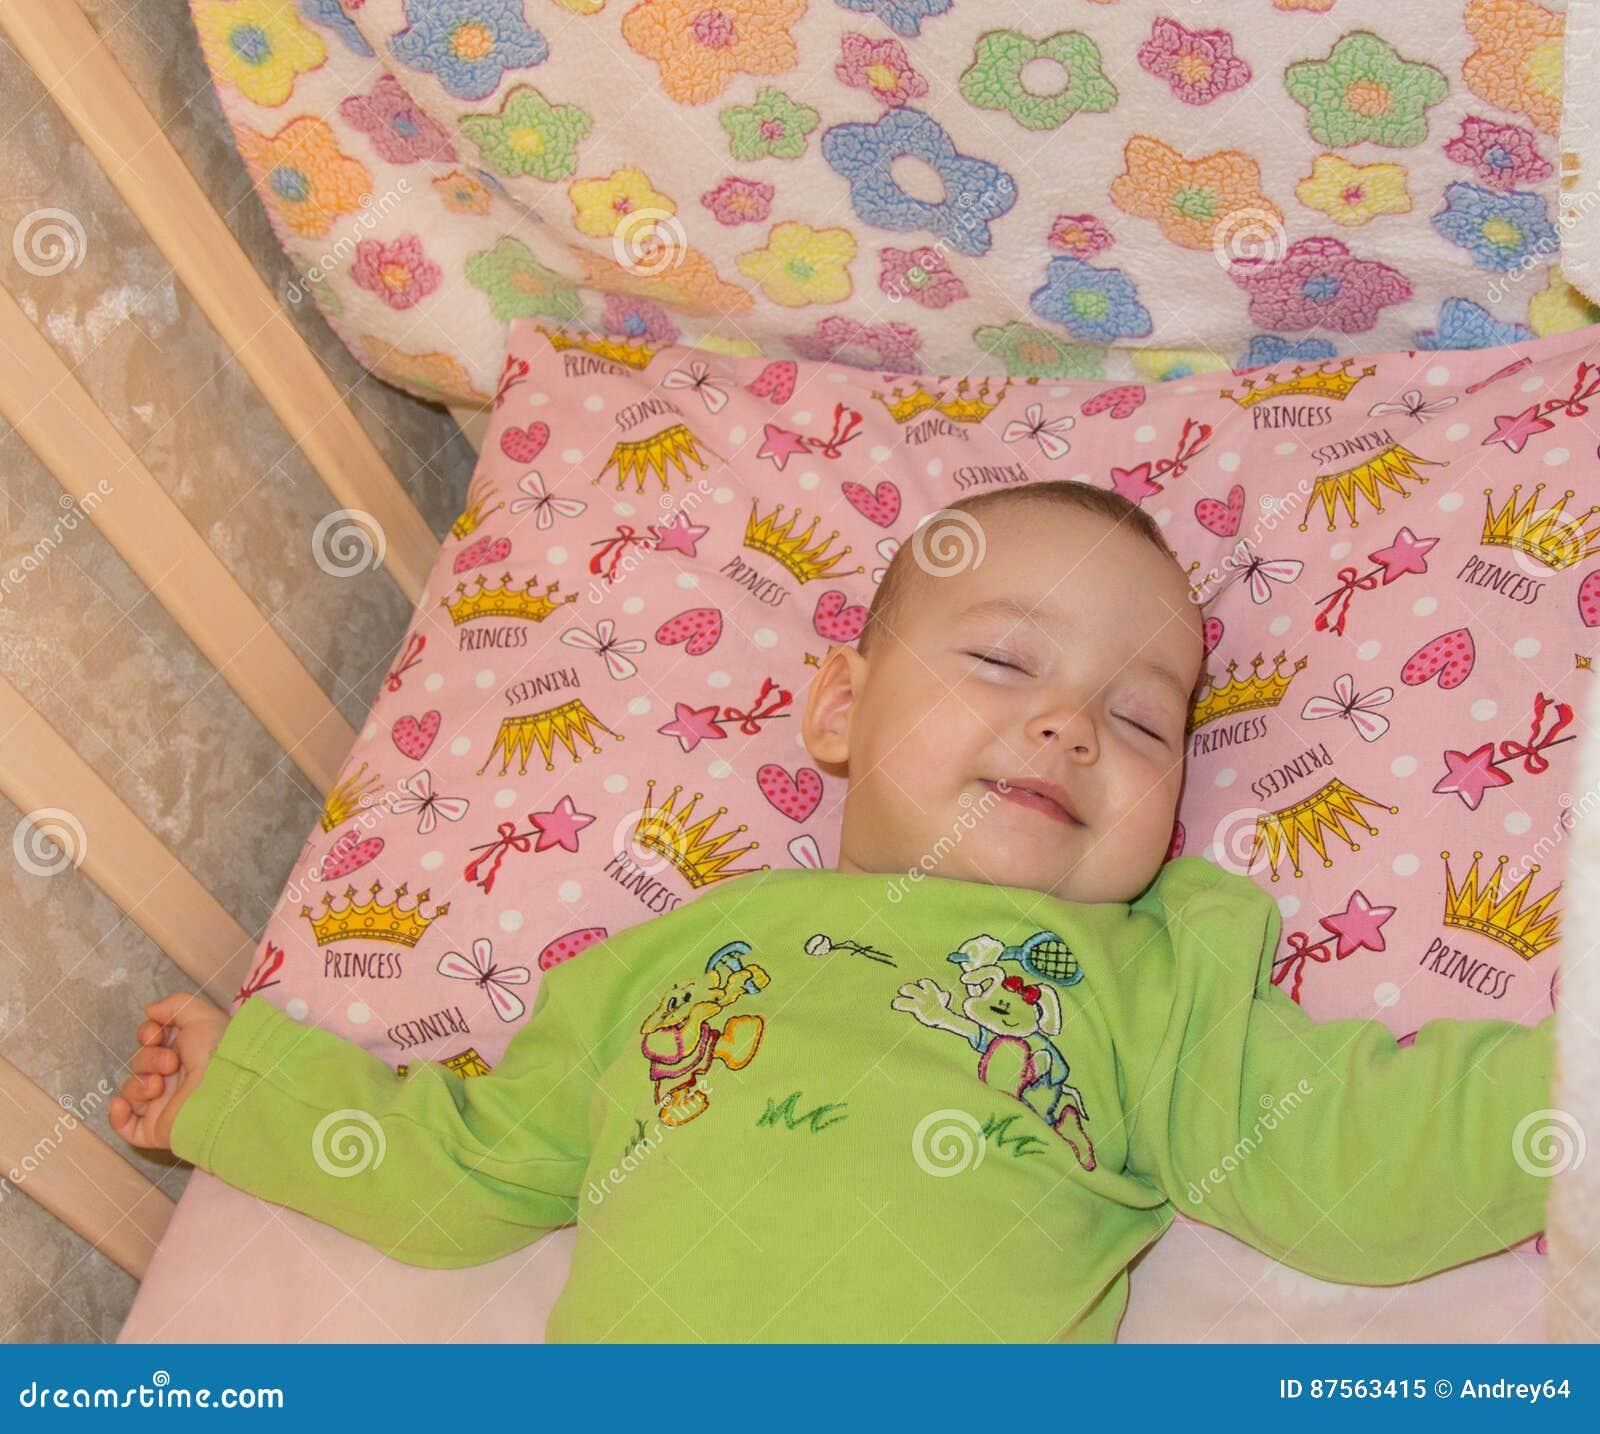 very nice sweet baby sleeping in crib stock image - image of